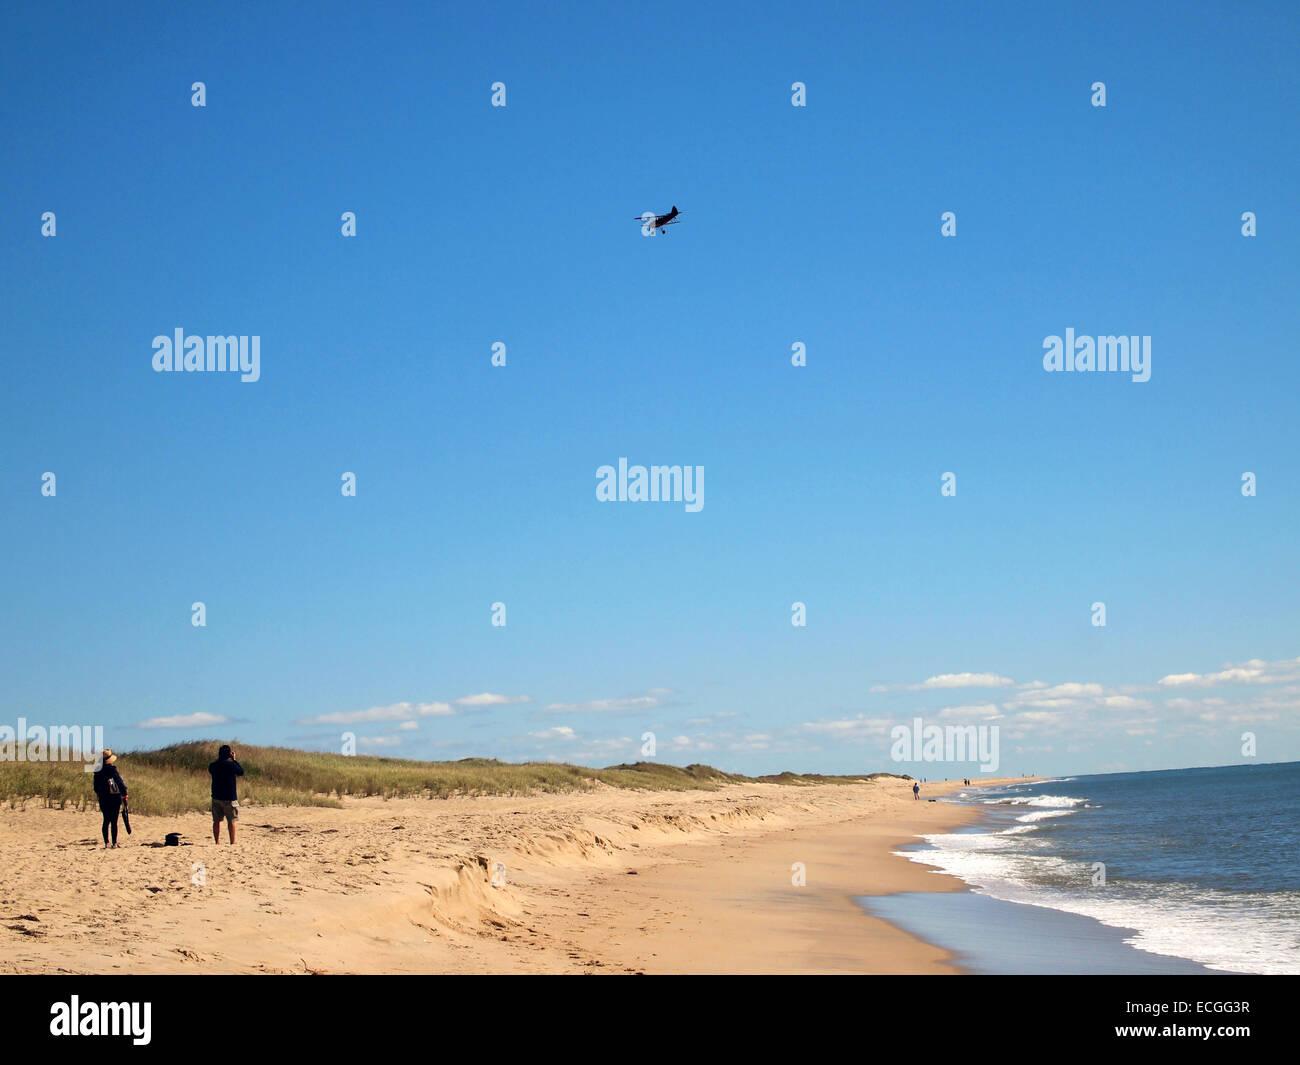 Bi Plane flying above a beach on Marthas Vineyard, Cape Cod, USA - Stock Image